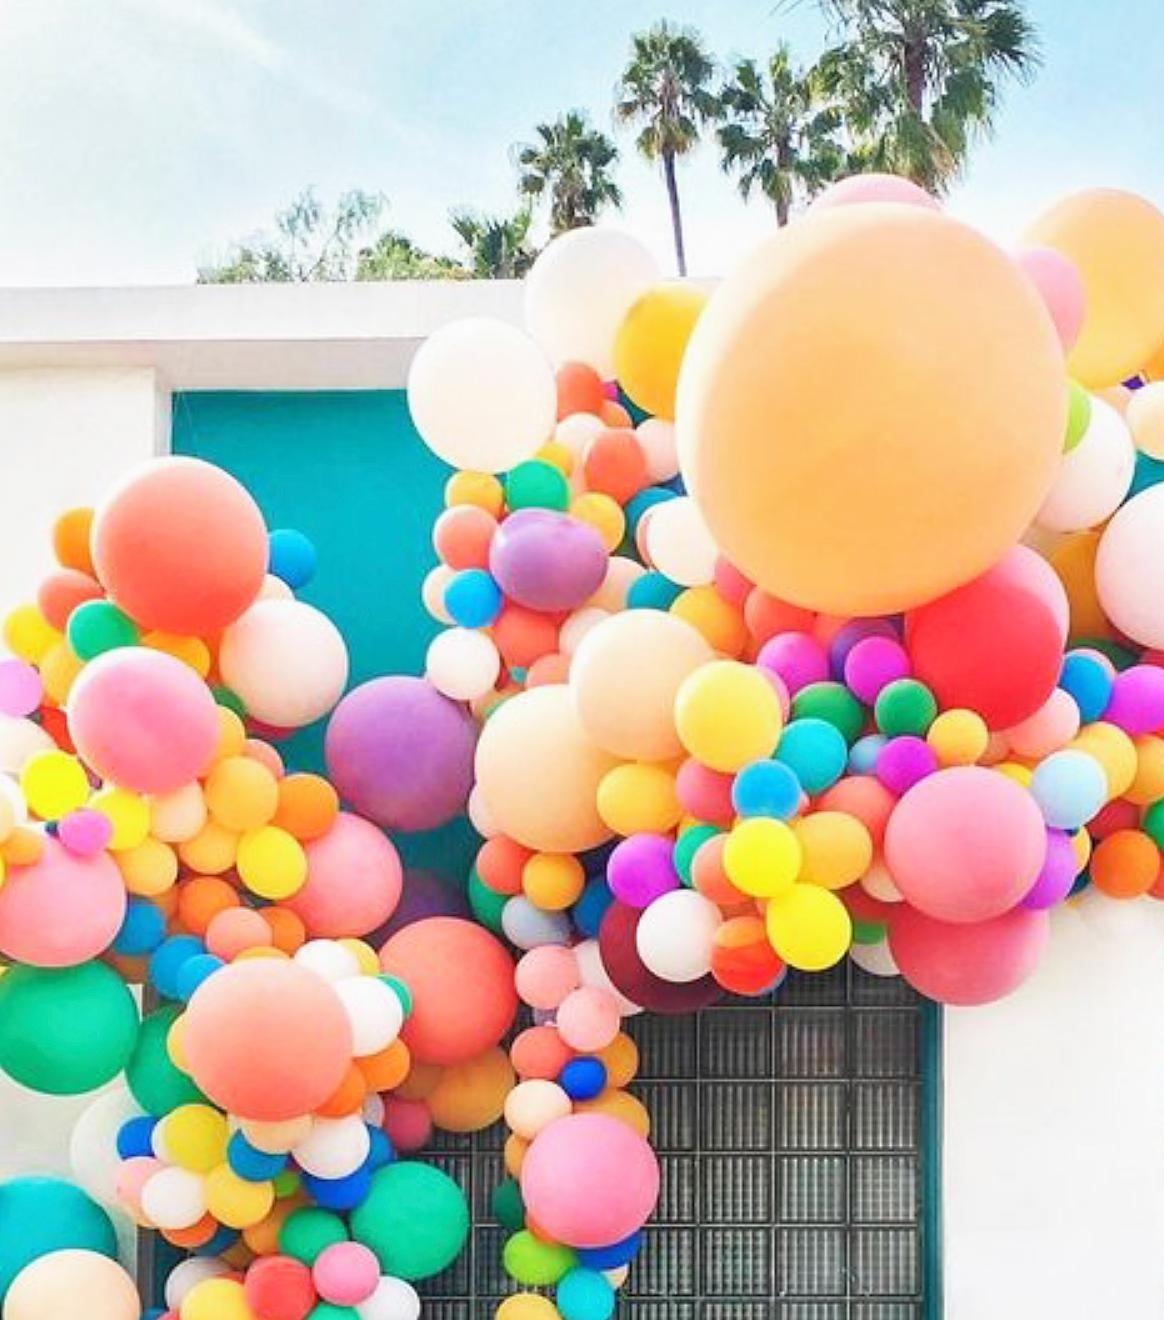 eventmates-blog-balloons-5.jpg